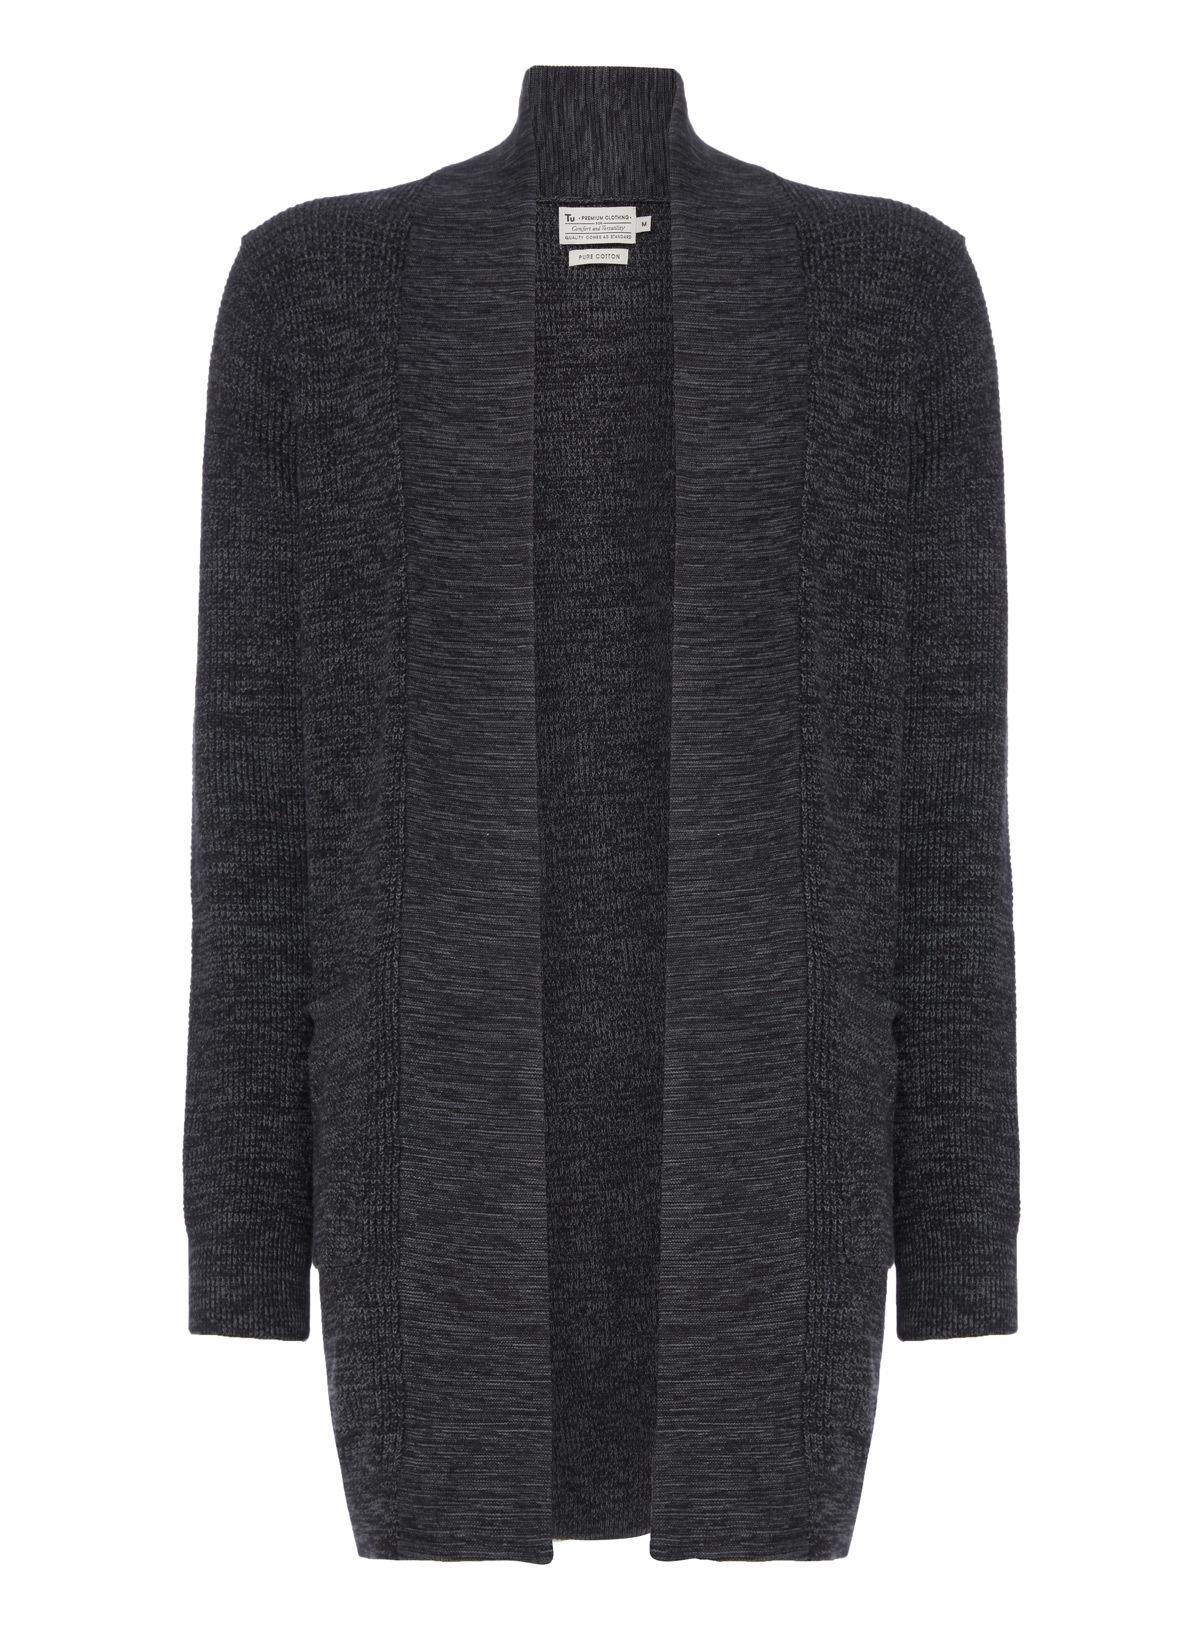 Mens Charcoal Longline Cardigan | Tu clothing